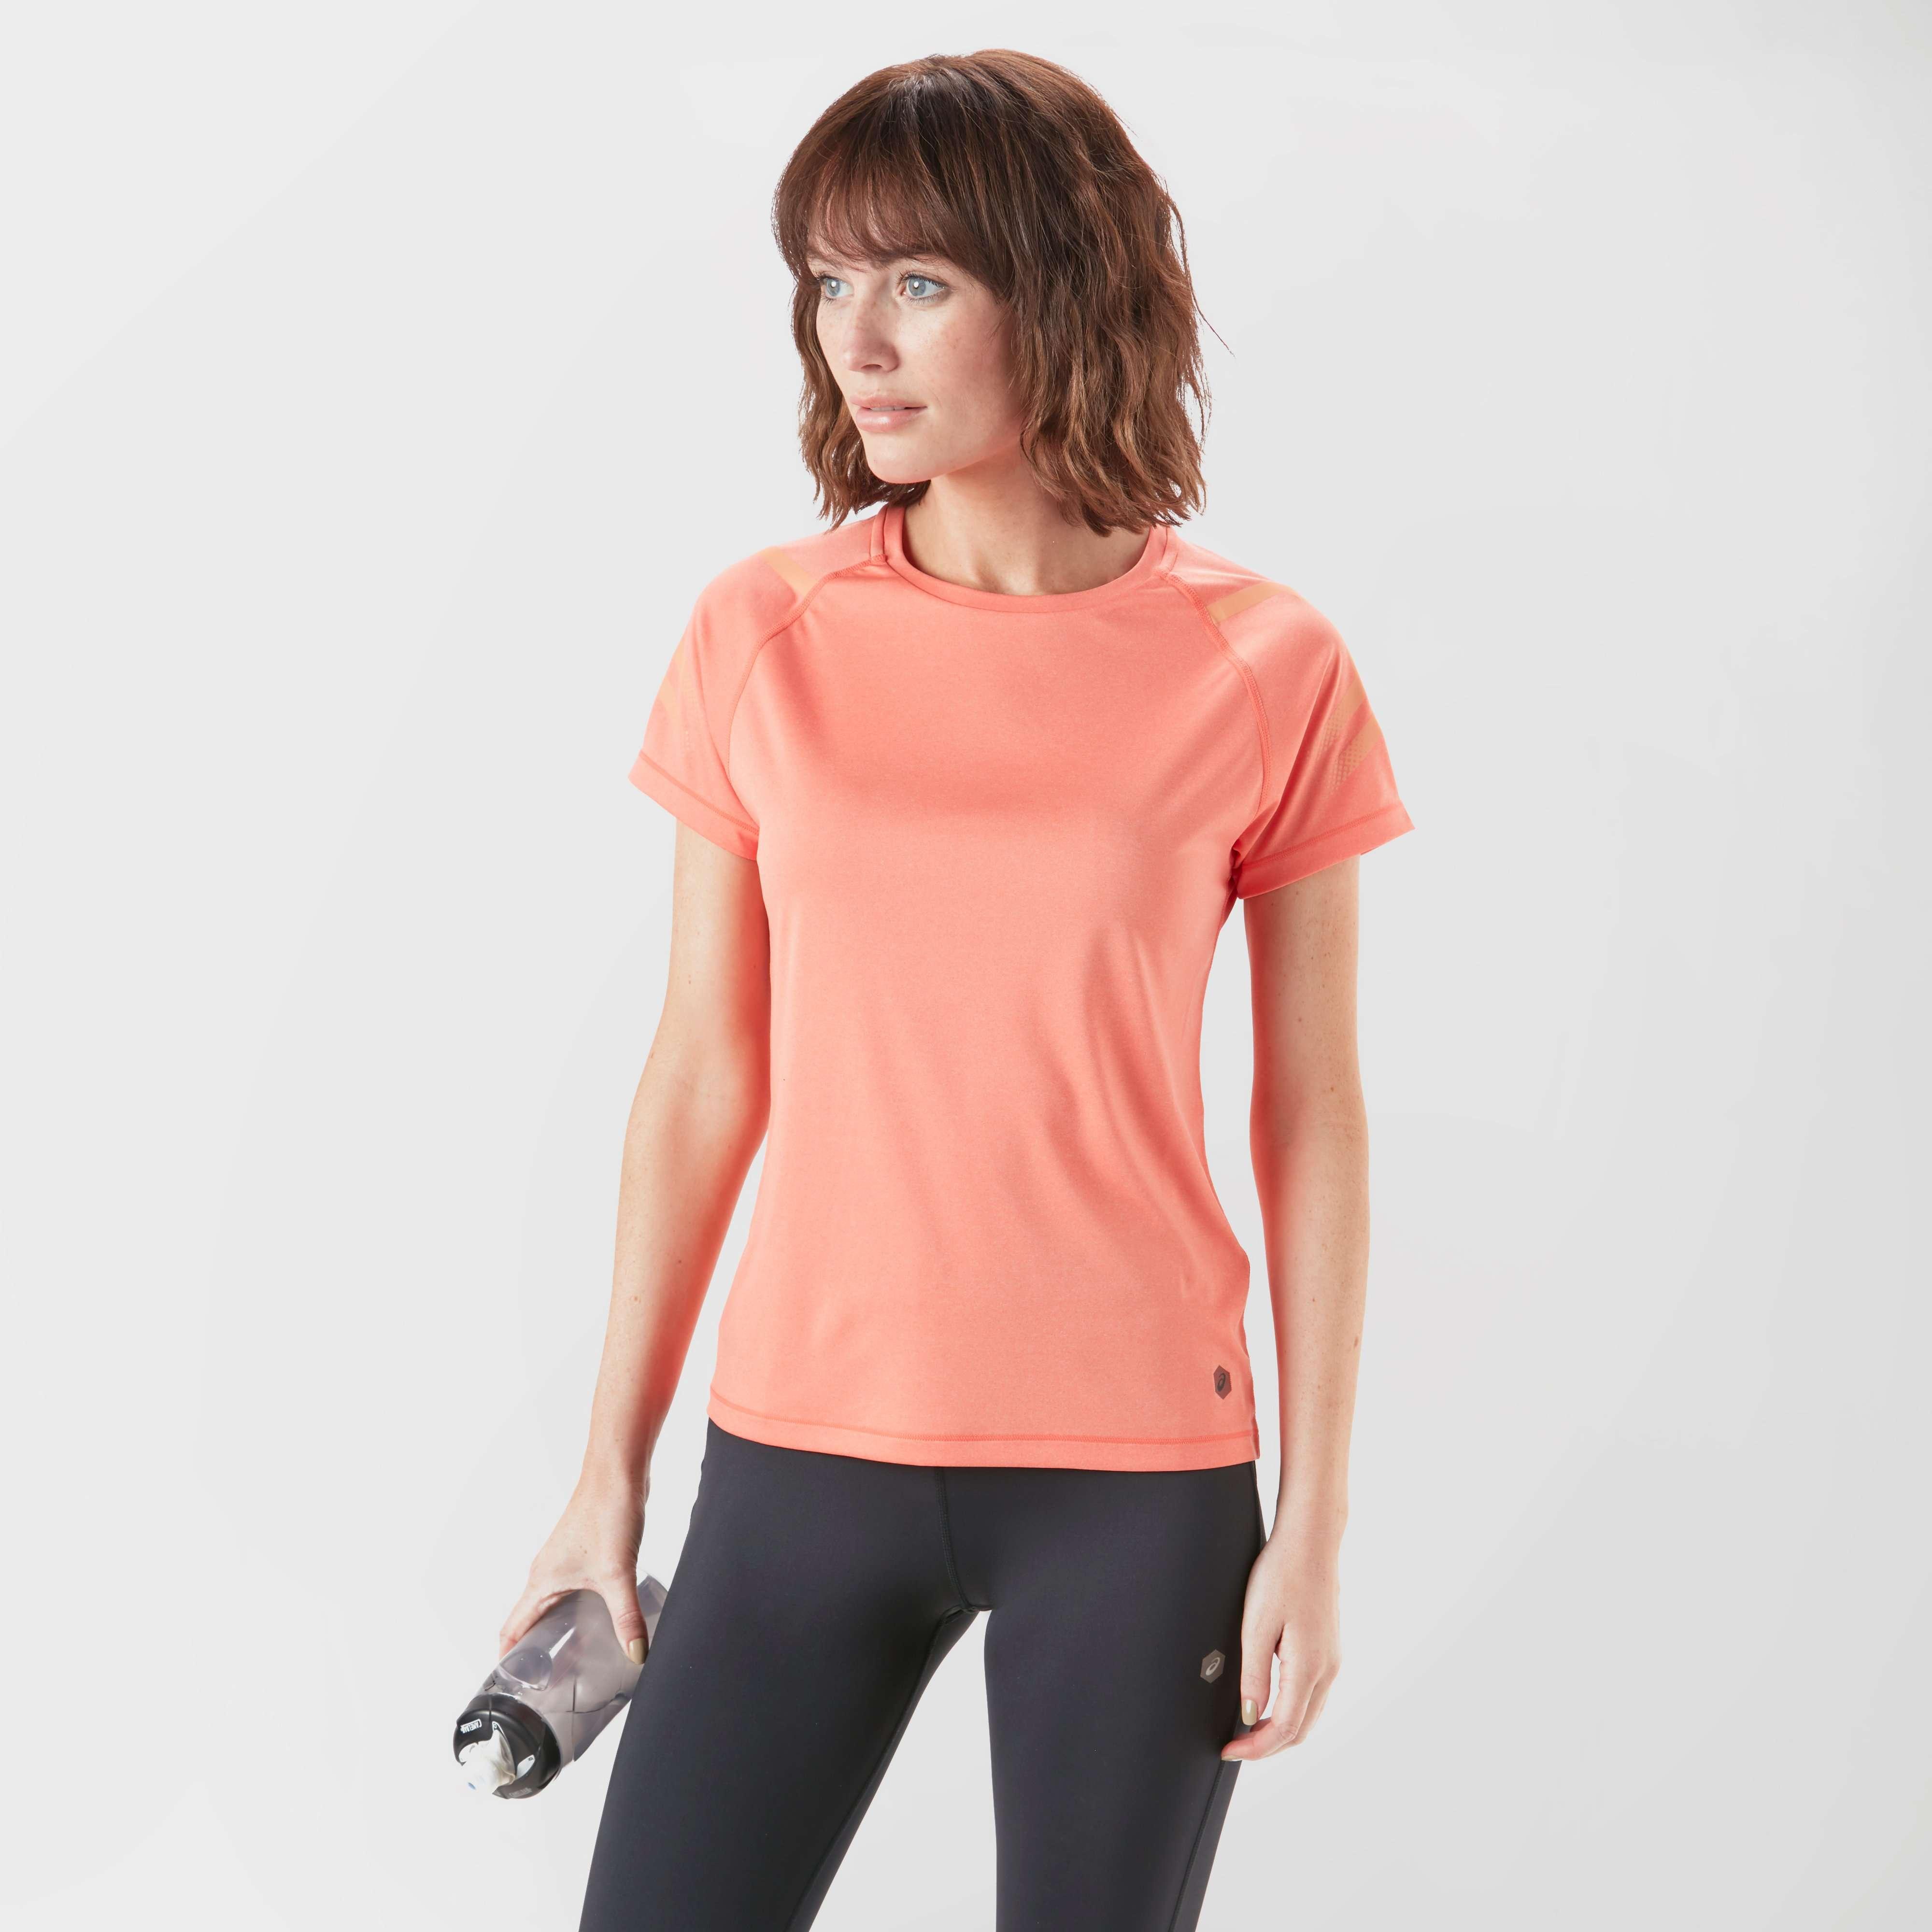 ASICS Women's Icon T-Shirt